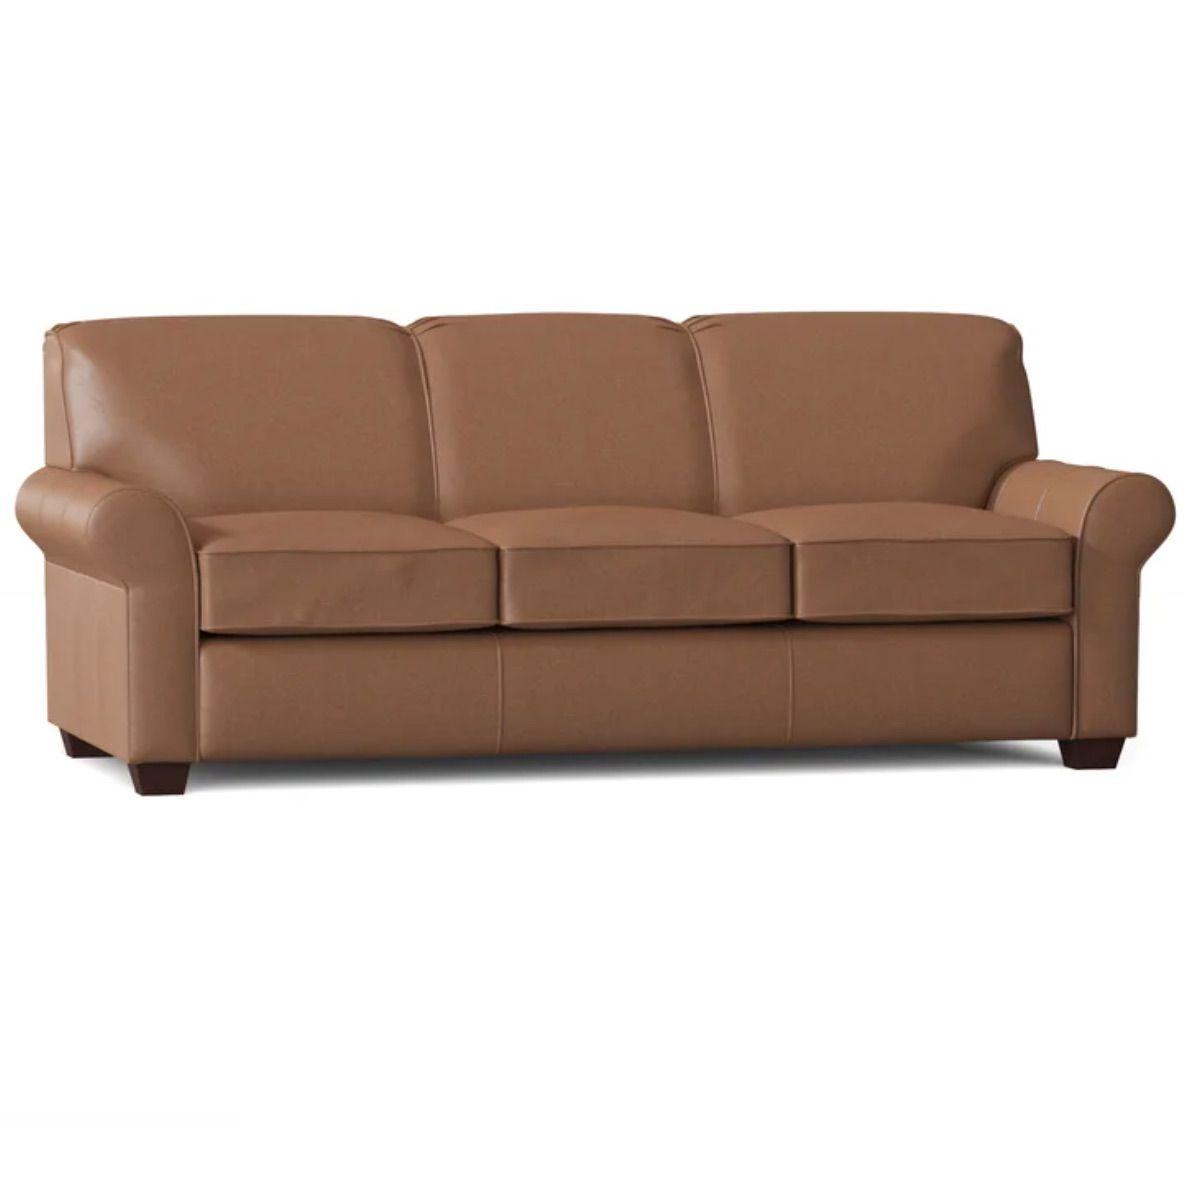 "Jennifer Genuine Leather 81"" Rolled Arm Sofa Bed"